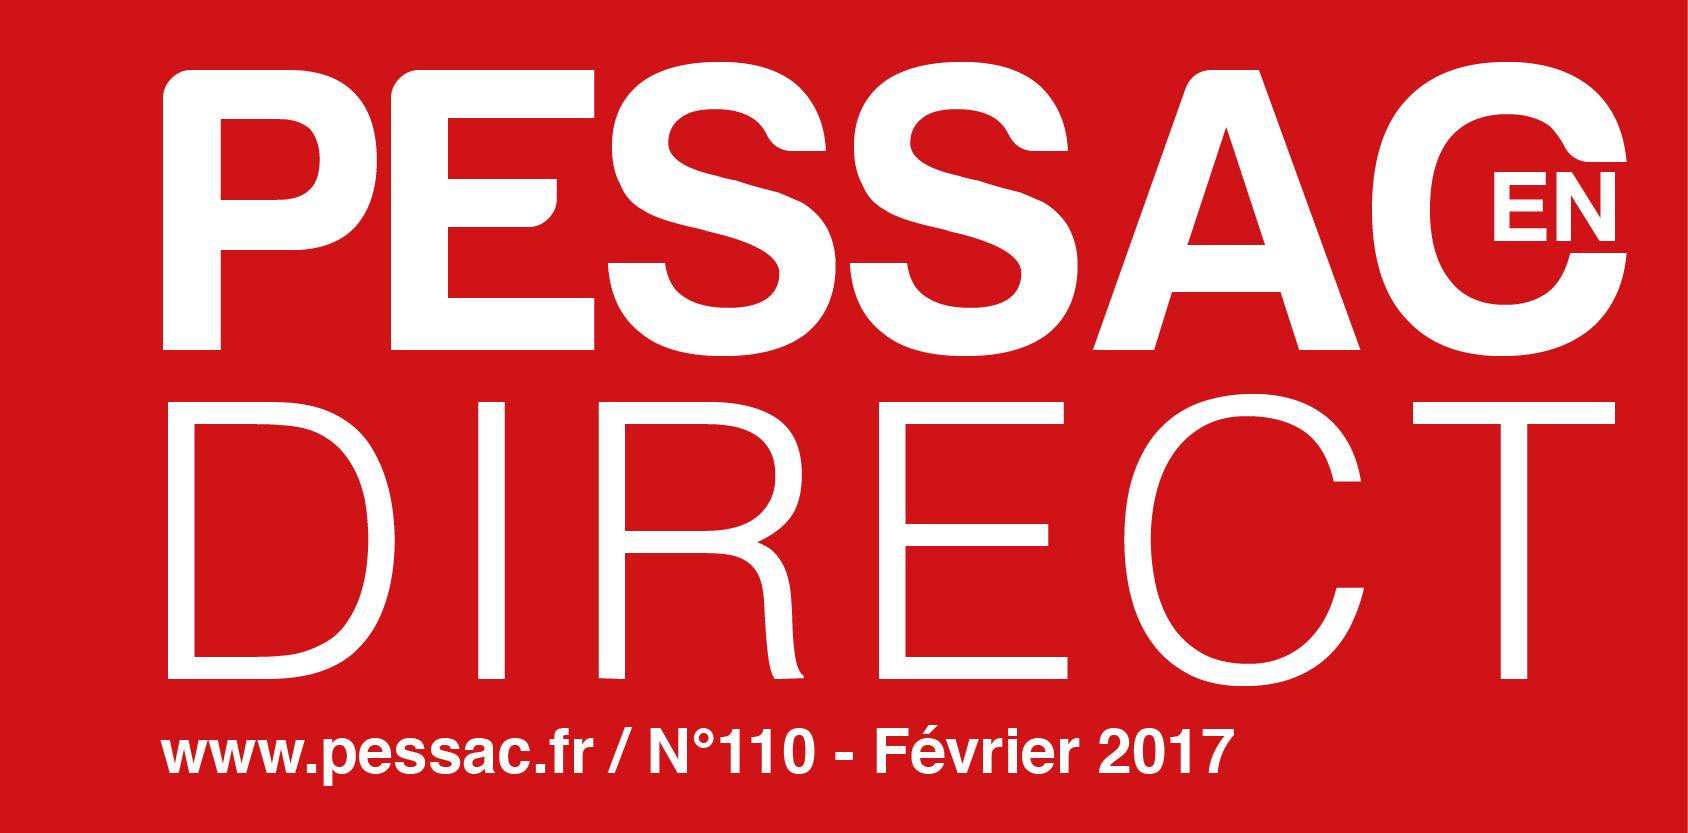 Pessac_en_direct